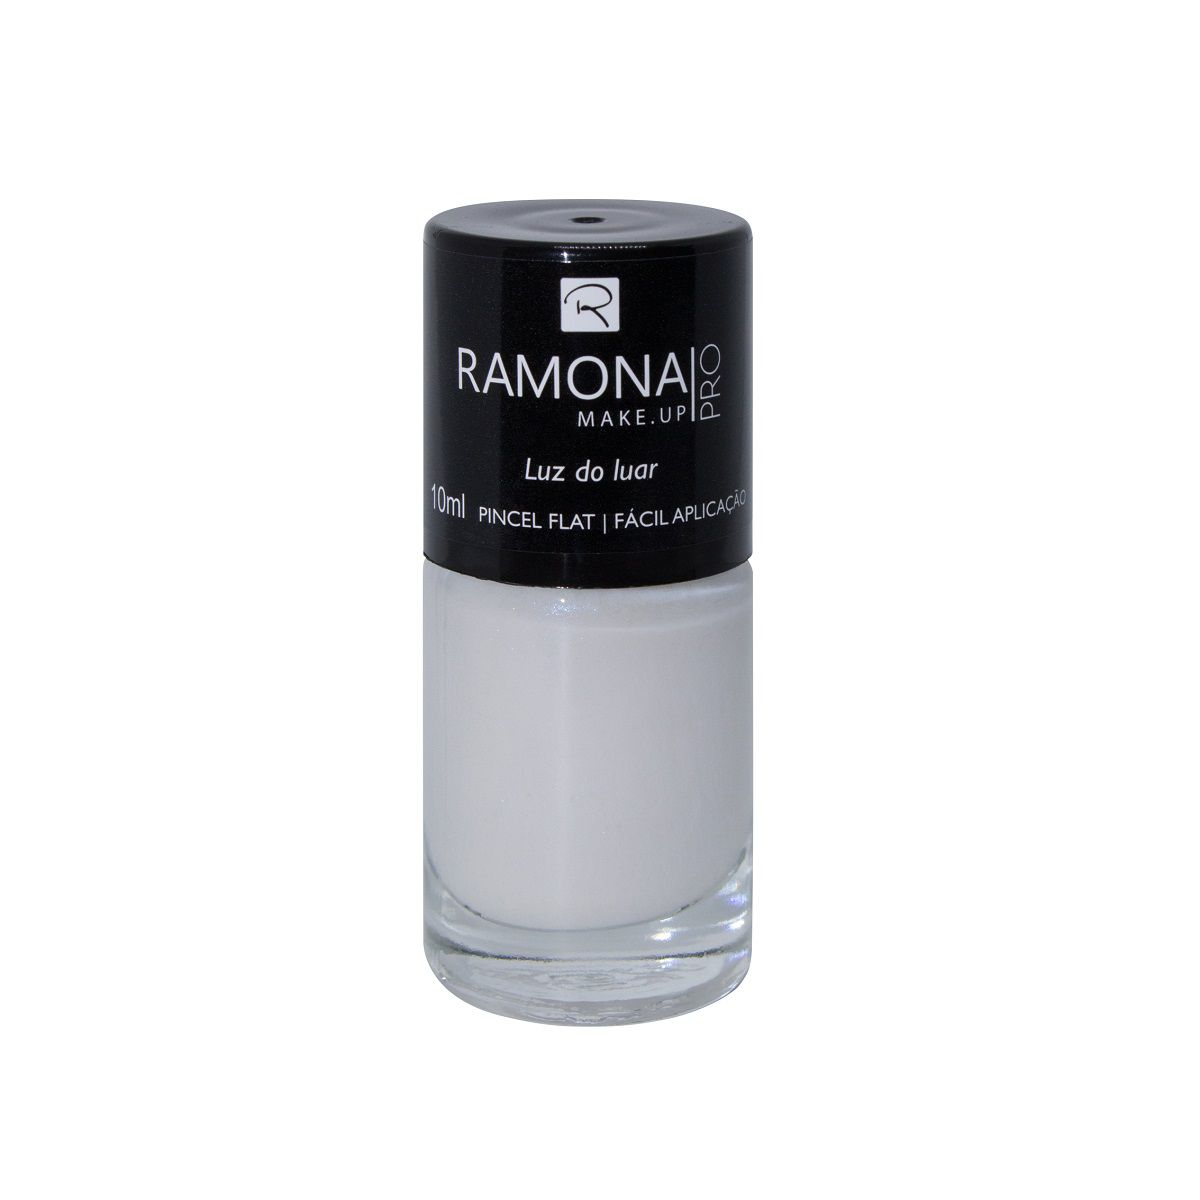 Esmalte cintilante Ramona Cosméticos Luz do luar 10ml